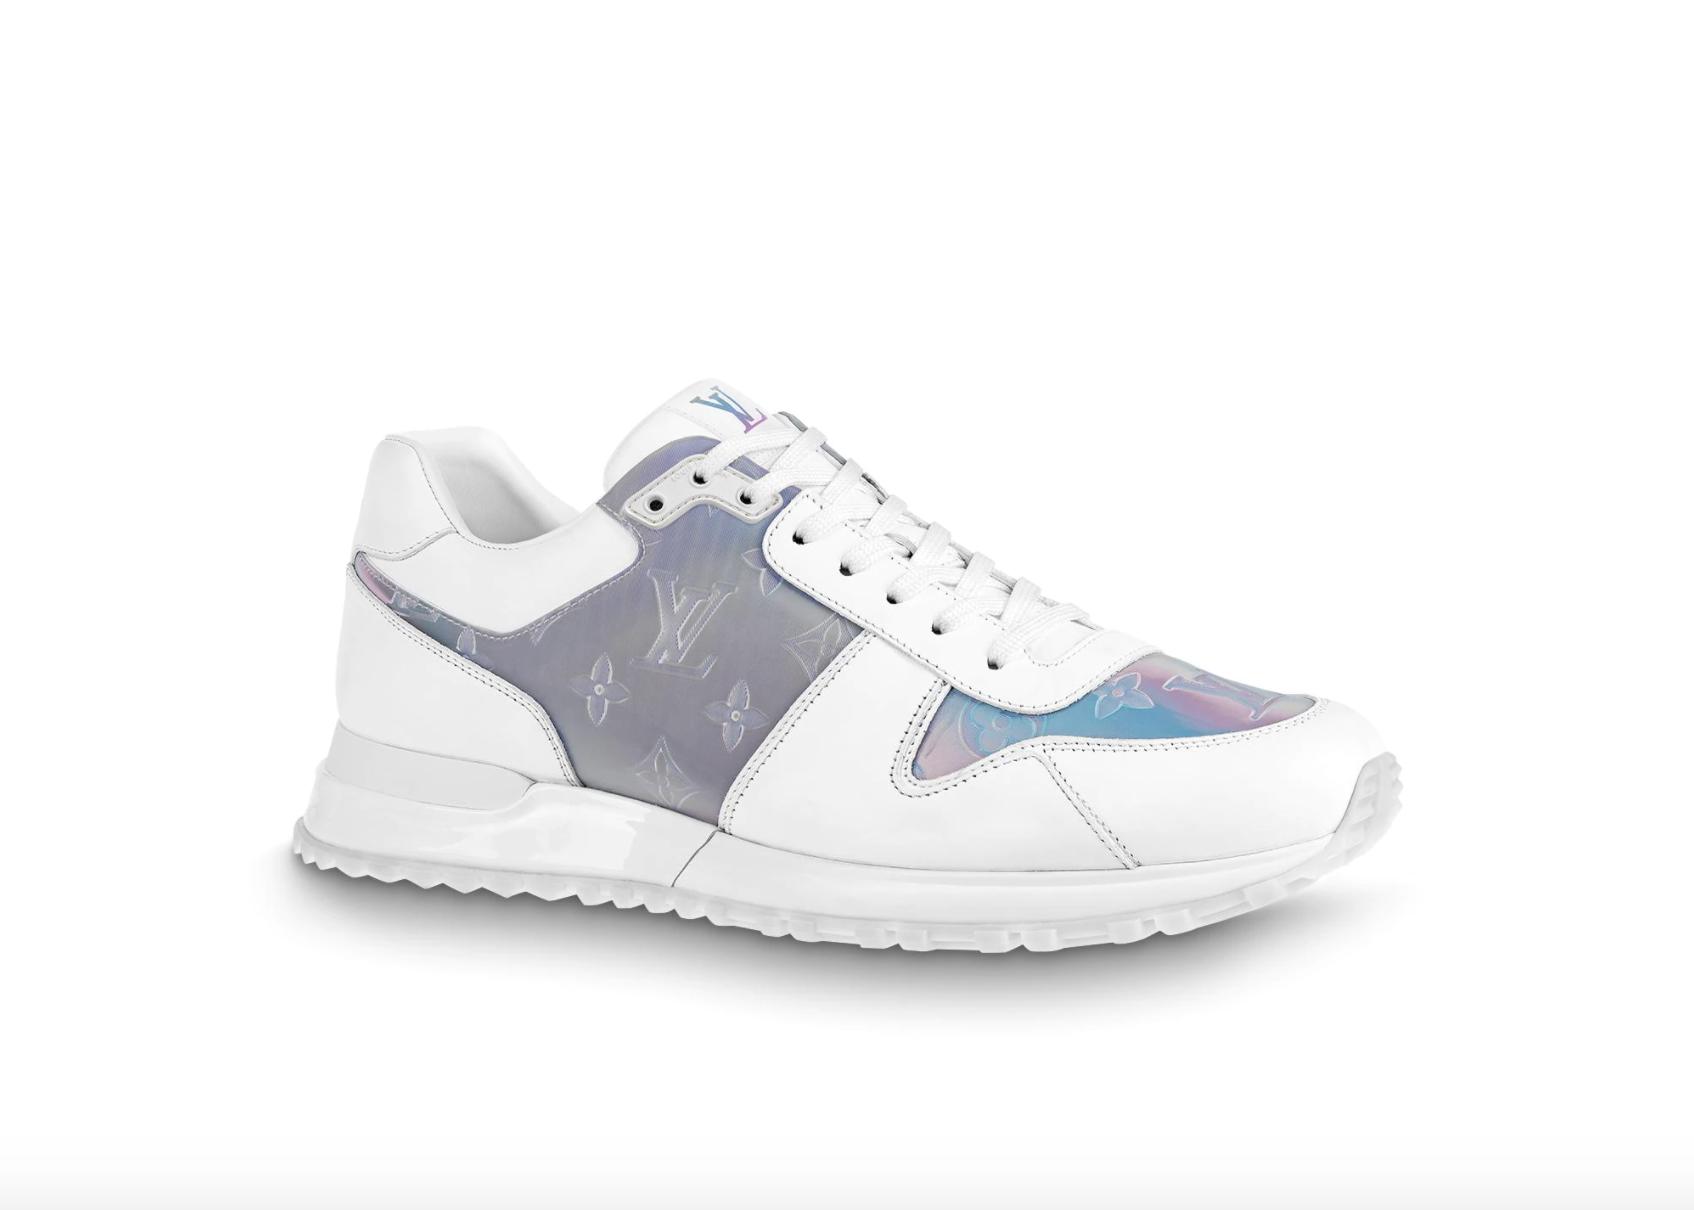 louis vuitton sneakers price